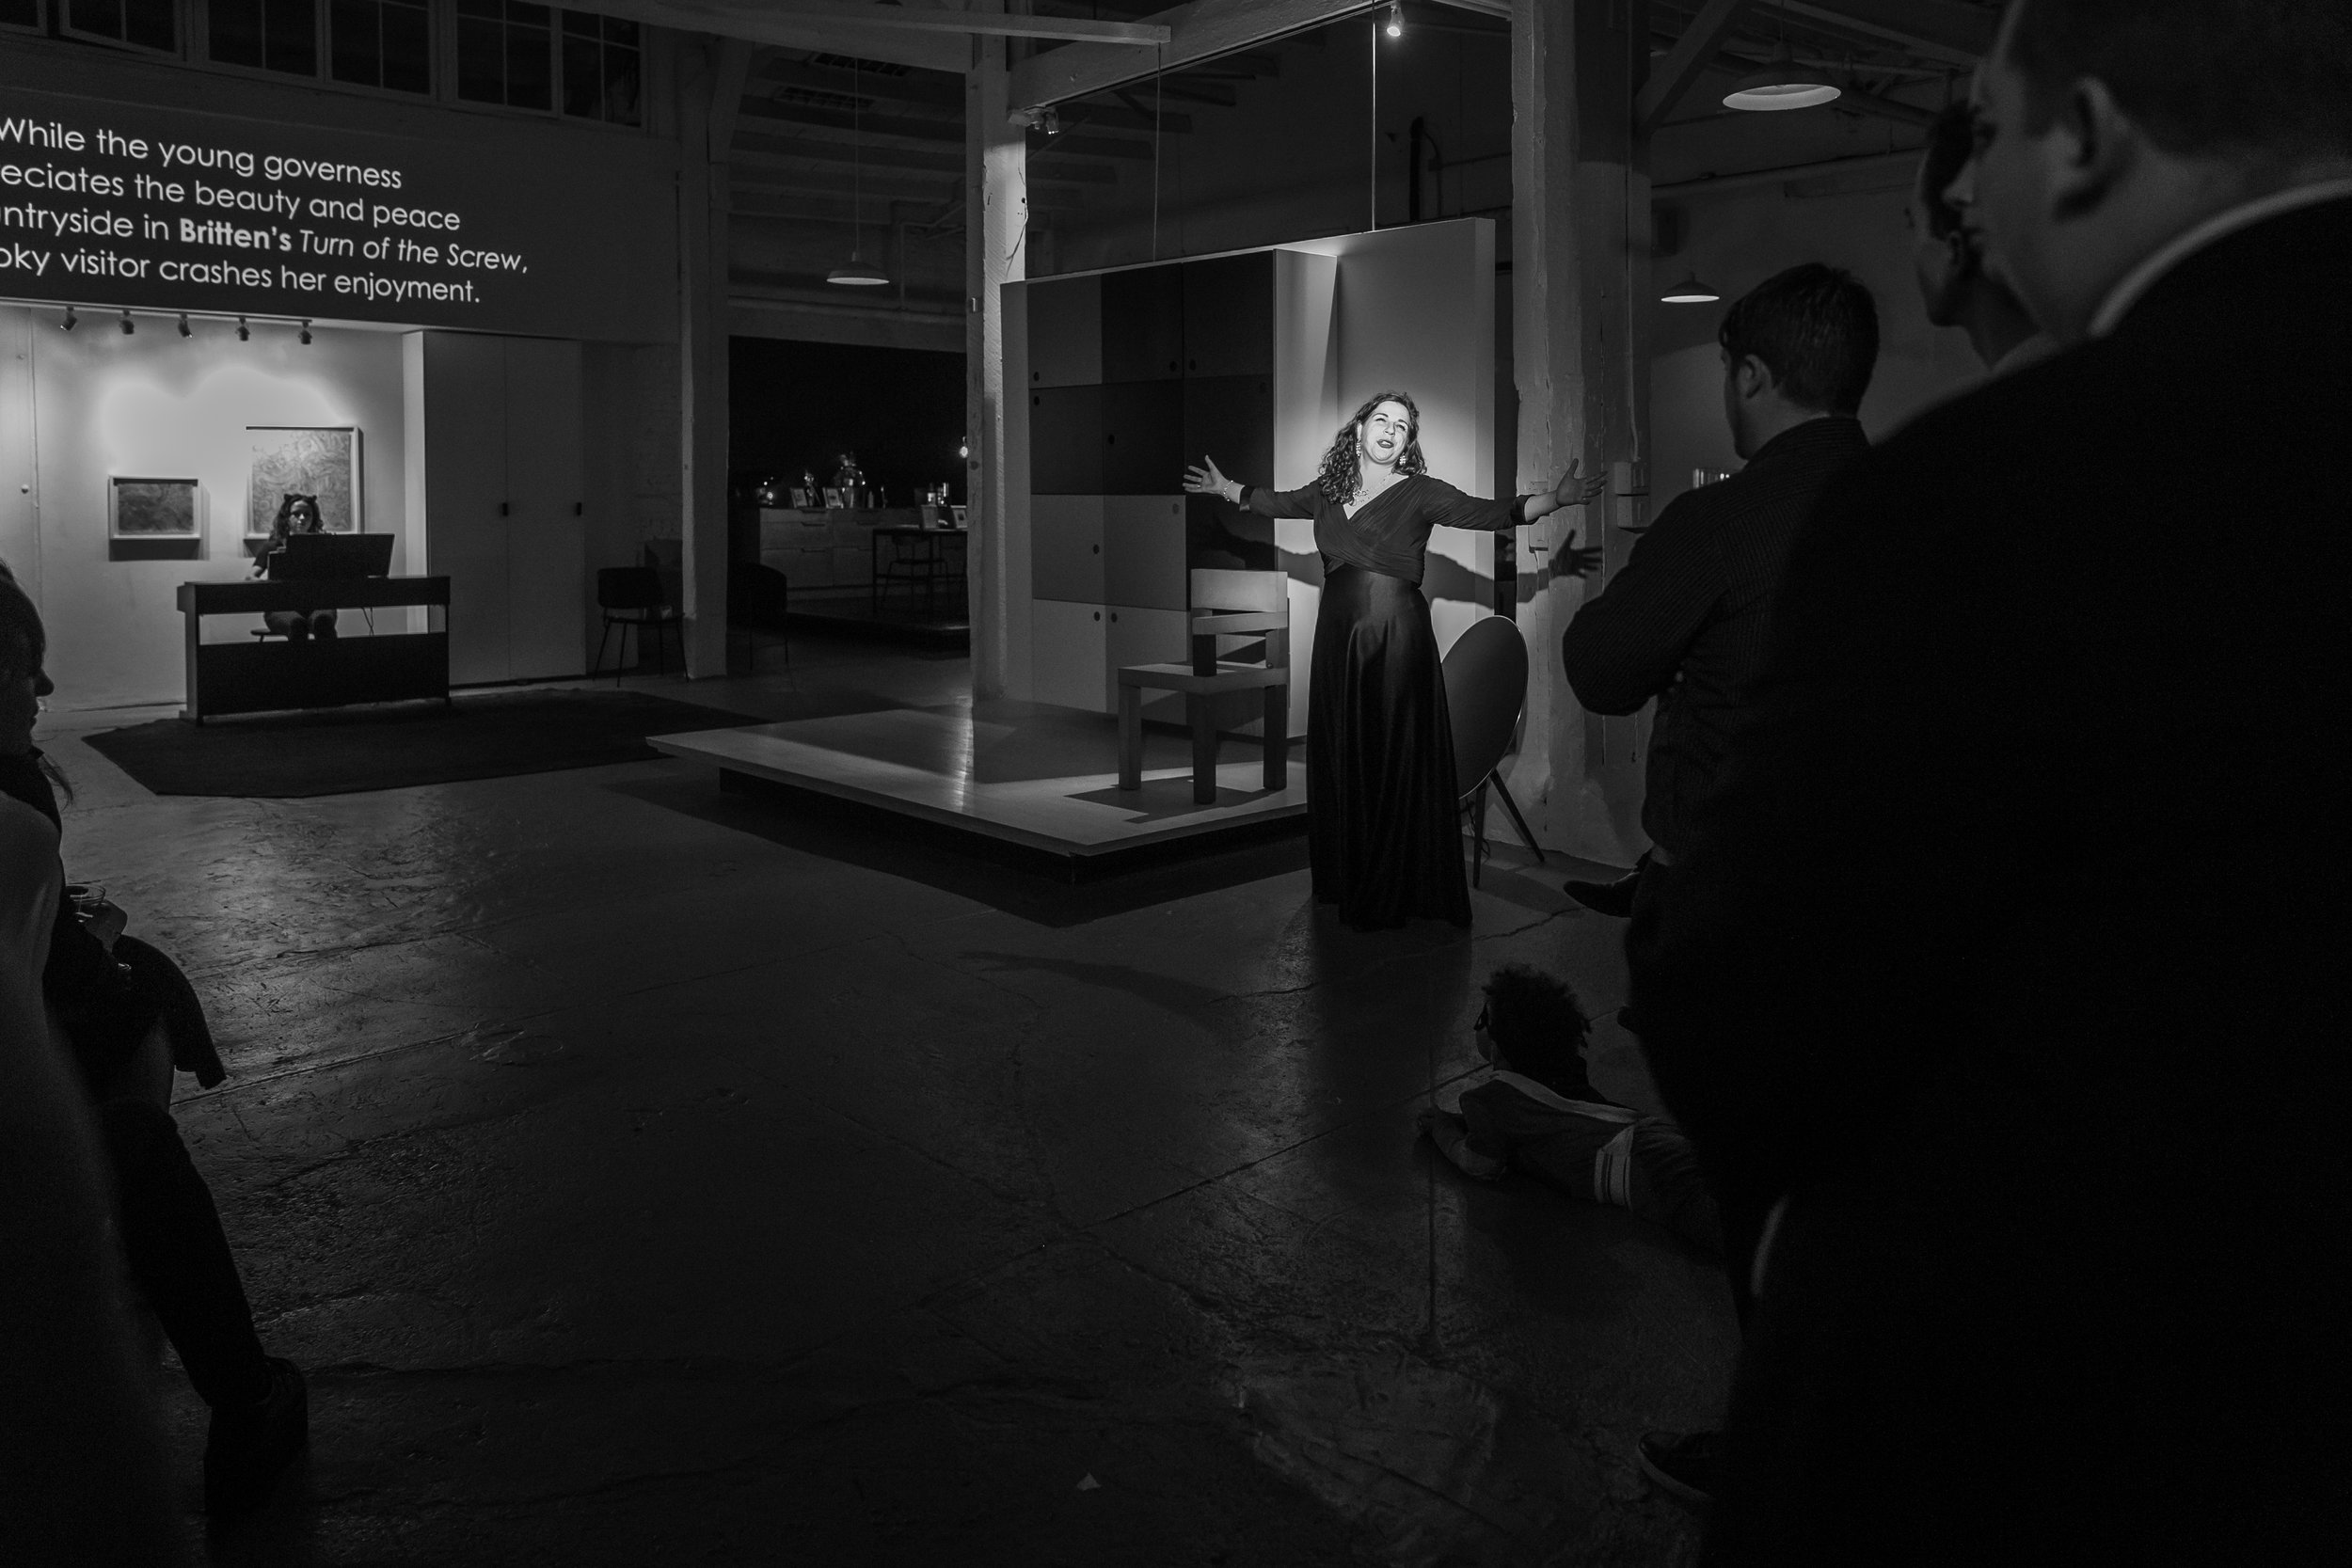 20171026 - Bare Opera's 3rd Annual Gala Event 0037.jpg